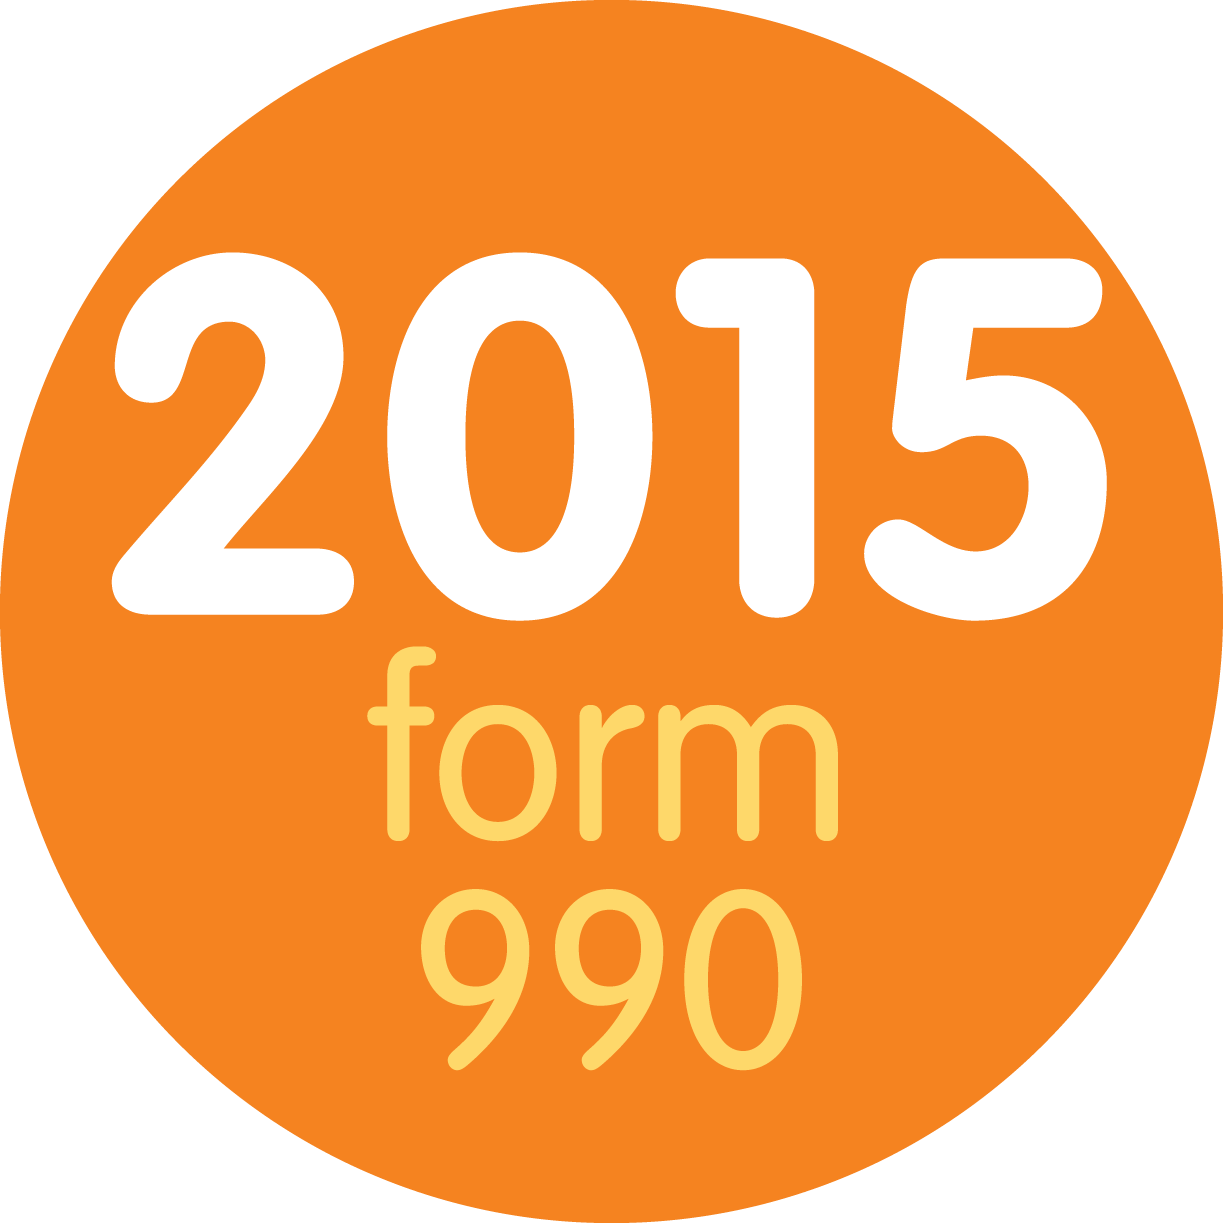 2015 Form 990